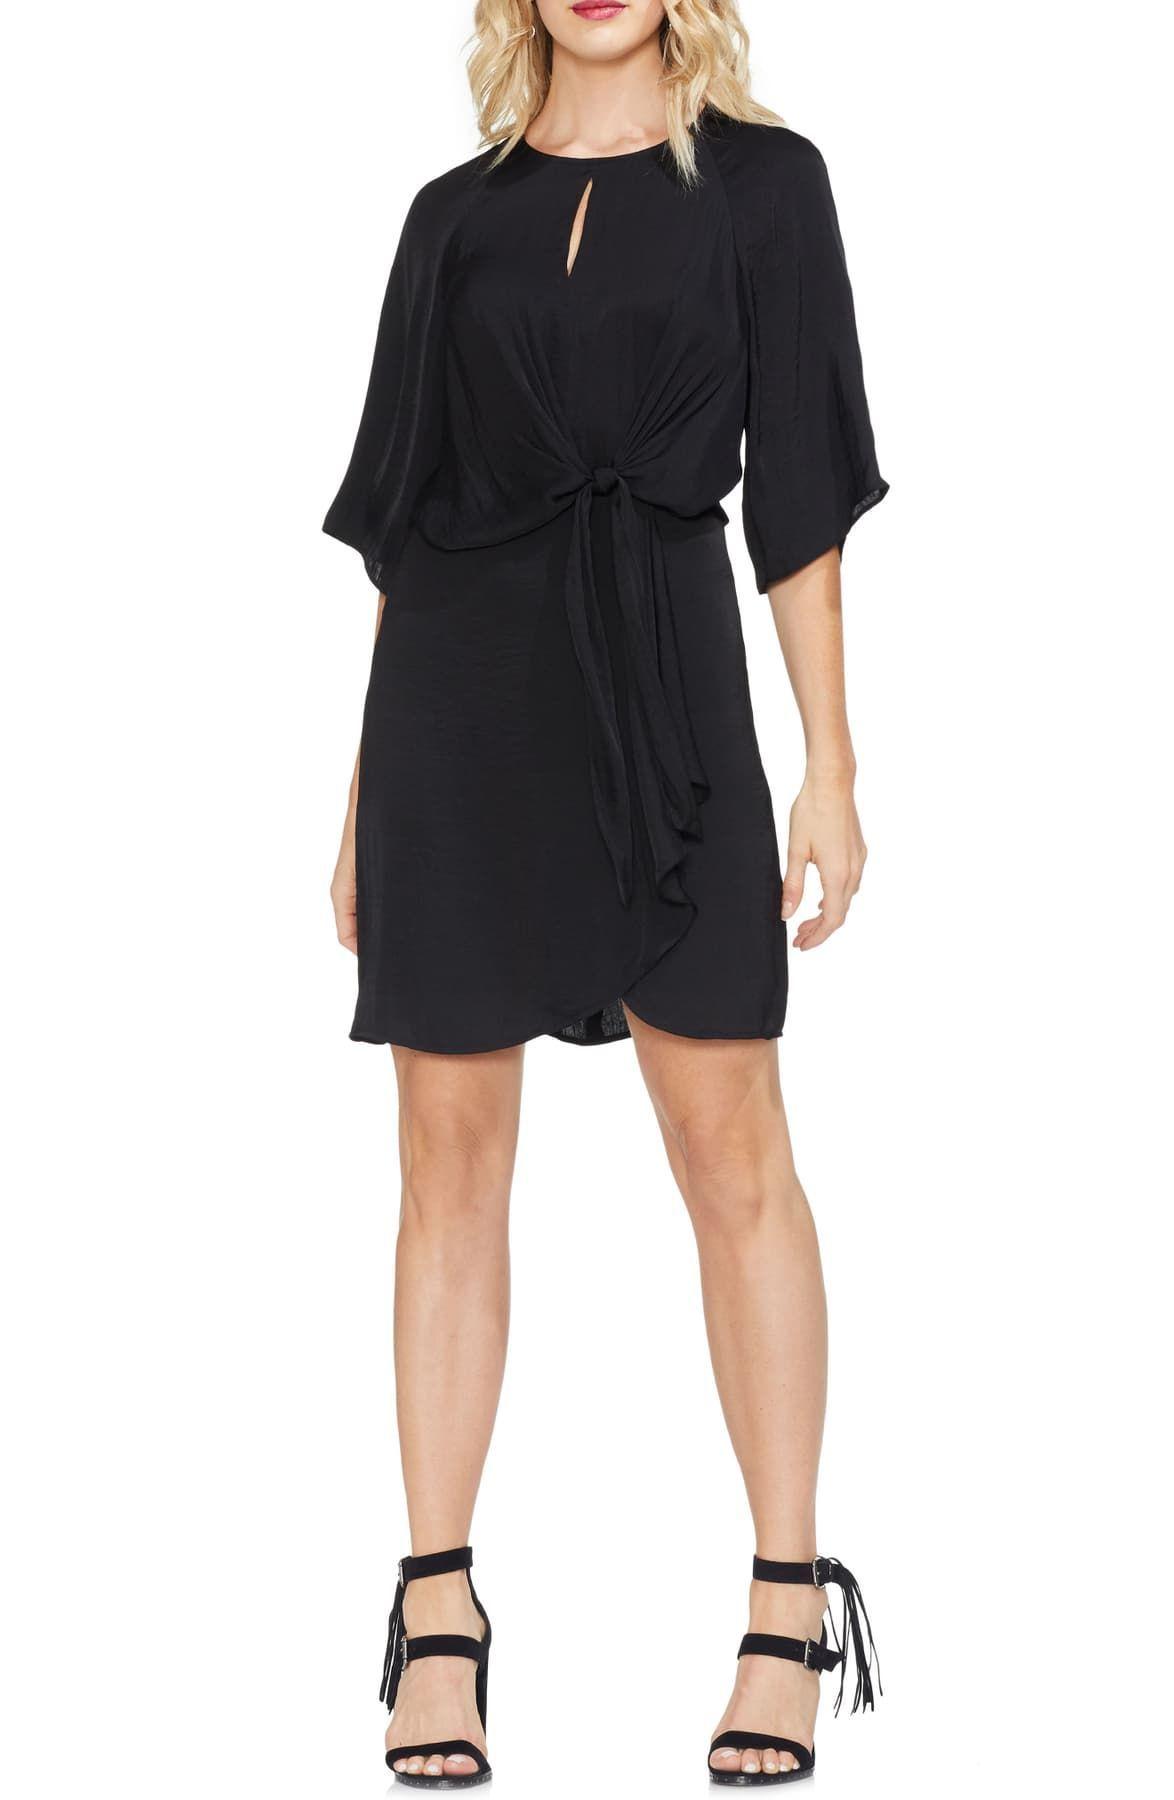 Vince Camuto Drape Sleeve Shift Dress Nordstrom Rack In 2020 Fashion Clothes Women Drape Sleeves Shift Dress [ 1800 x 1174 Pixel ]